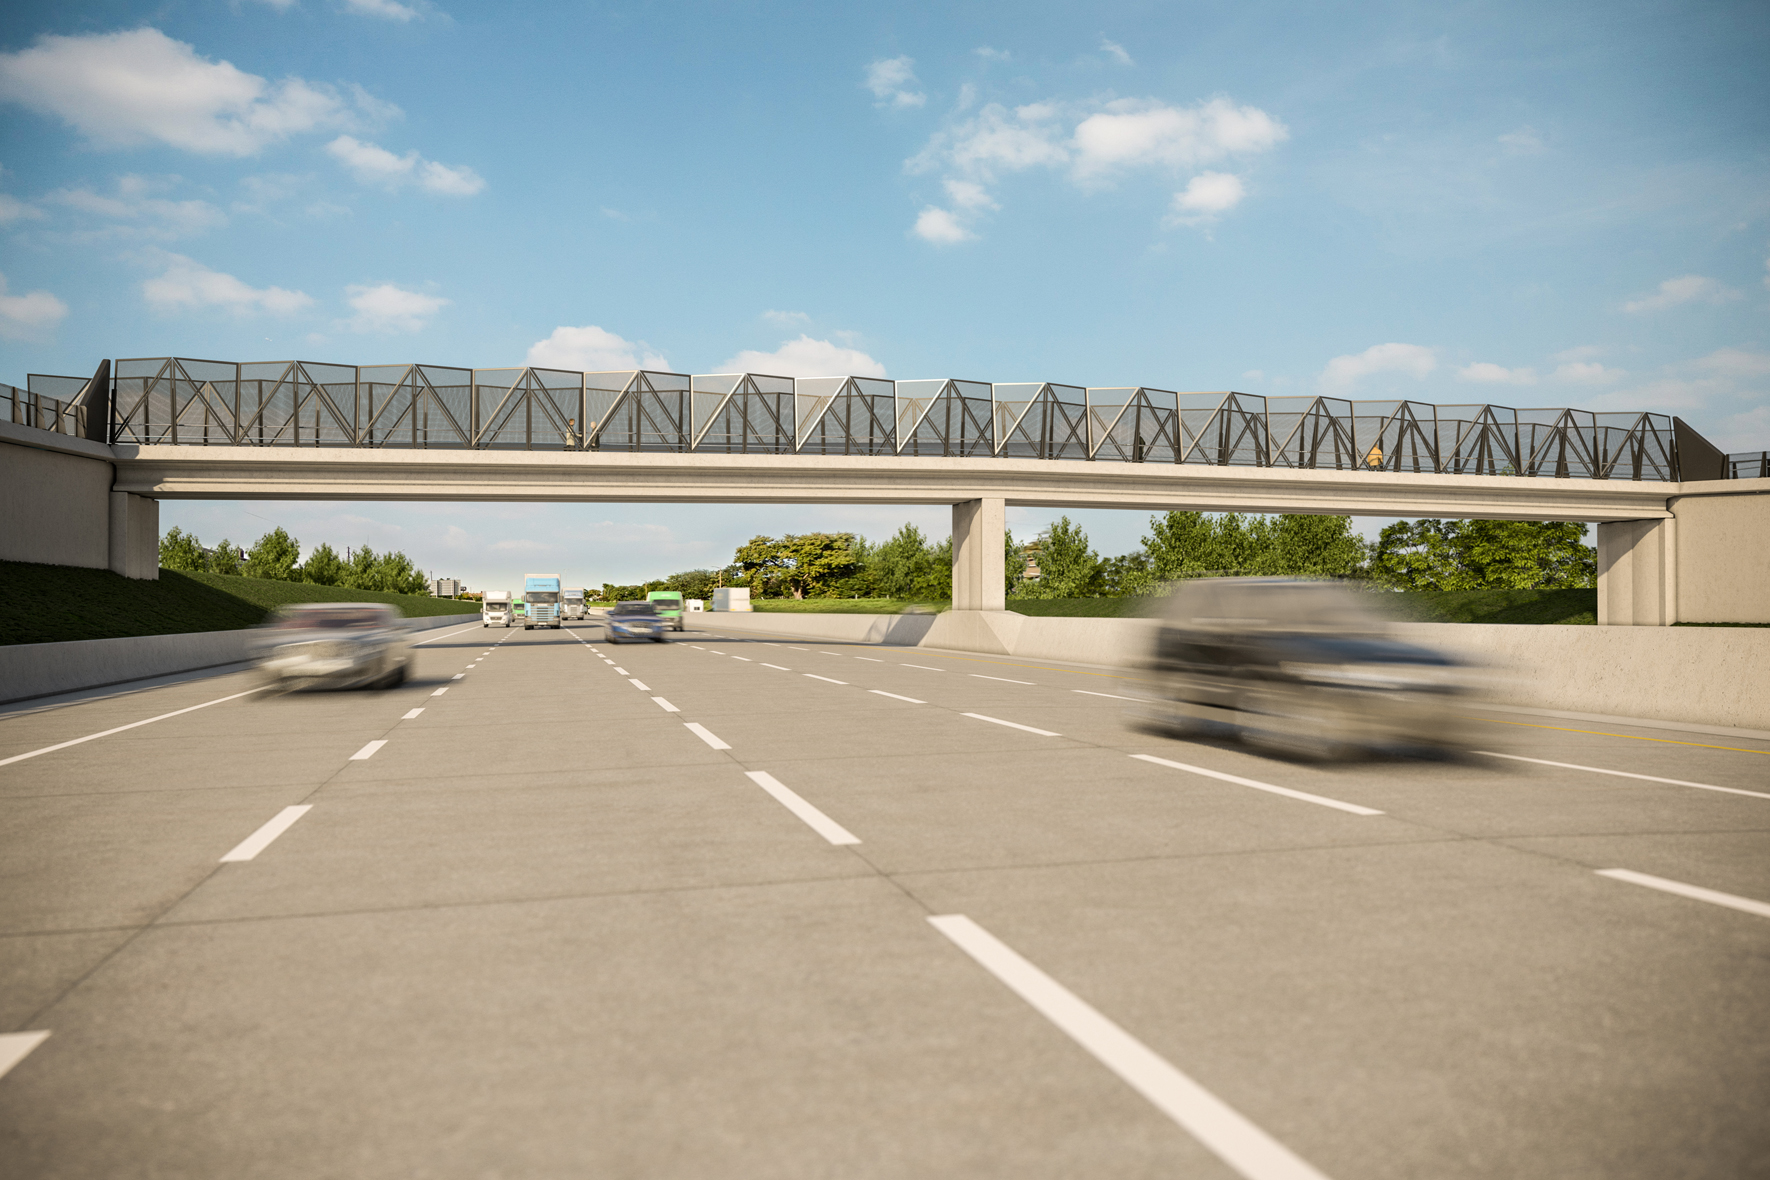 I-75 Overpasses